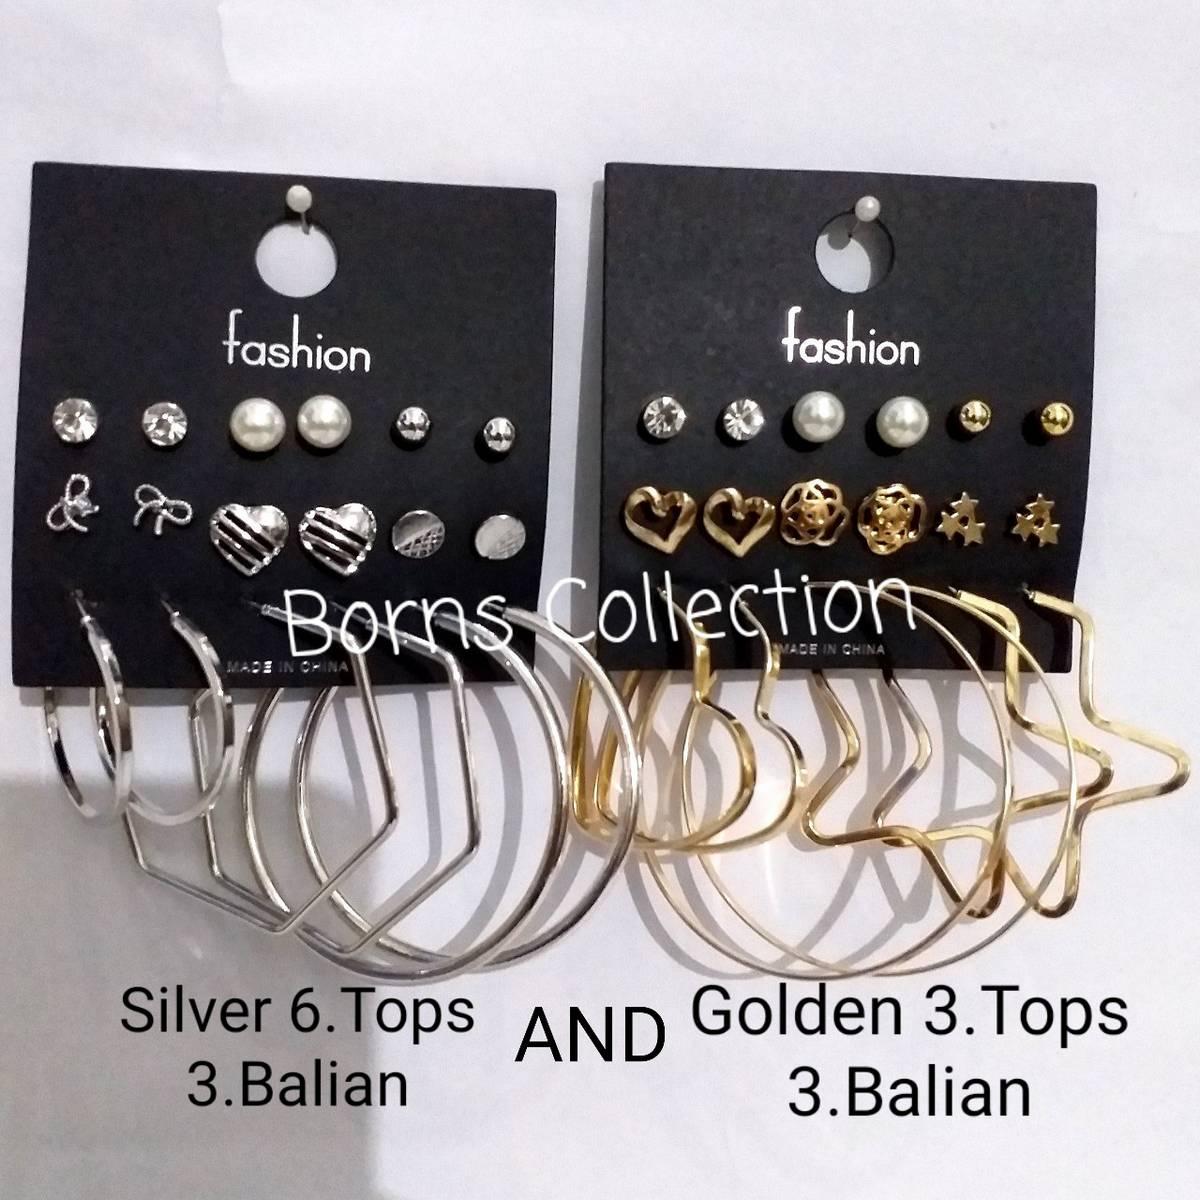 Amazing Big 6 Pairs/Sets Hoop Earring Stud Earring Fashion For Women Girl Jewellery Earring(3 Bali And 6 Tops)